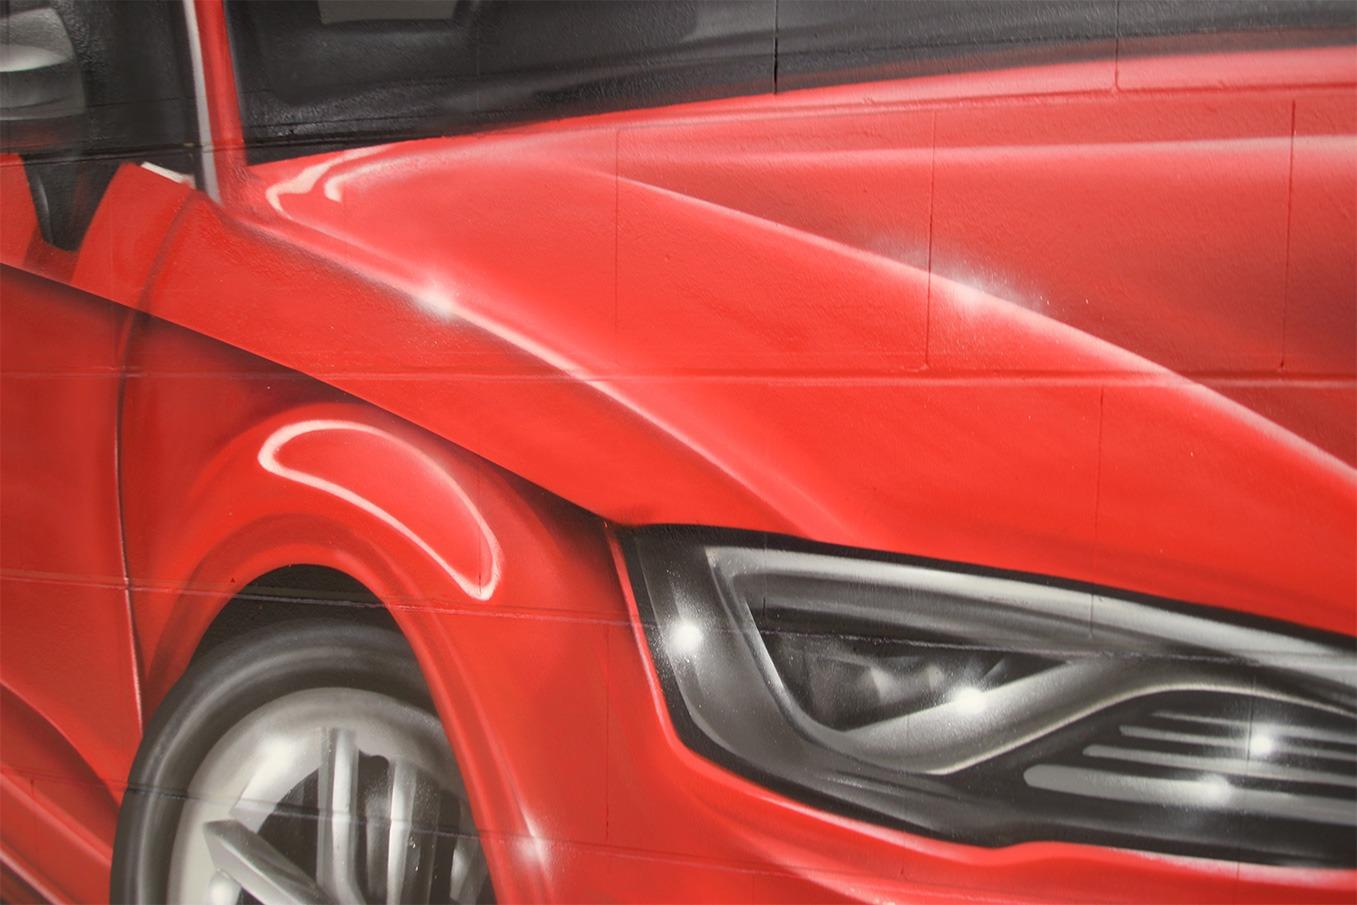 graffitiauftrag-graffitikuenstler-artmos4-Audi_Ingolstadt_2014_Auto_grafisch_innen_rot_fotorealistisch_Fahrzeuge